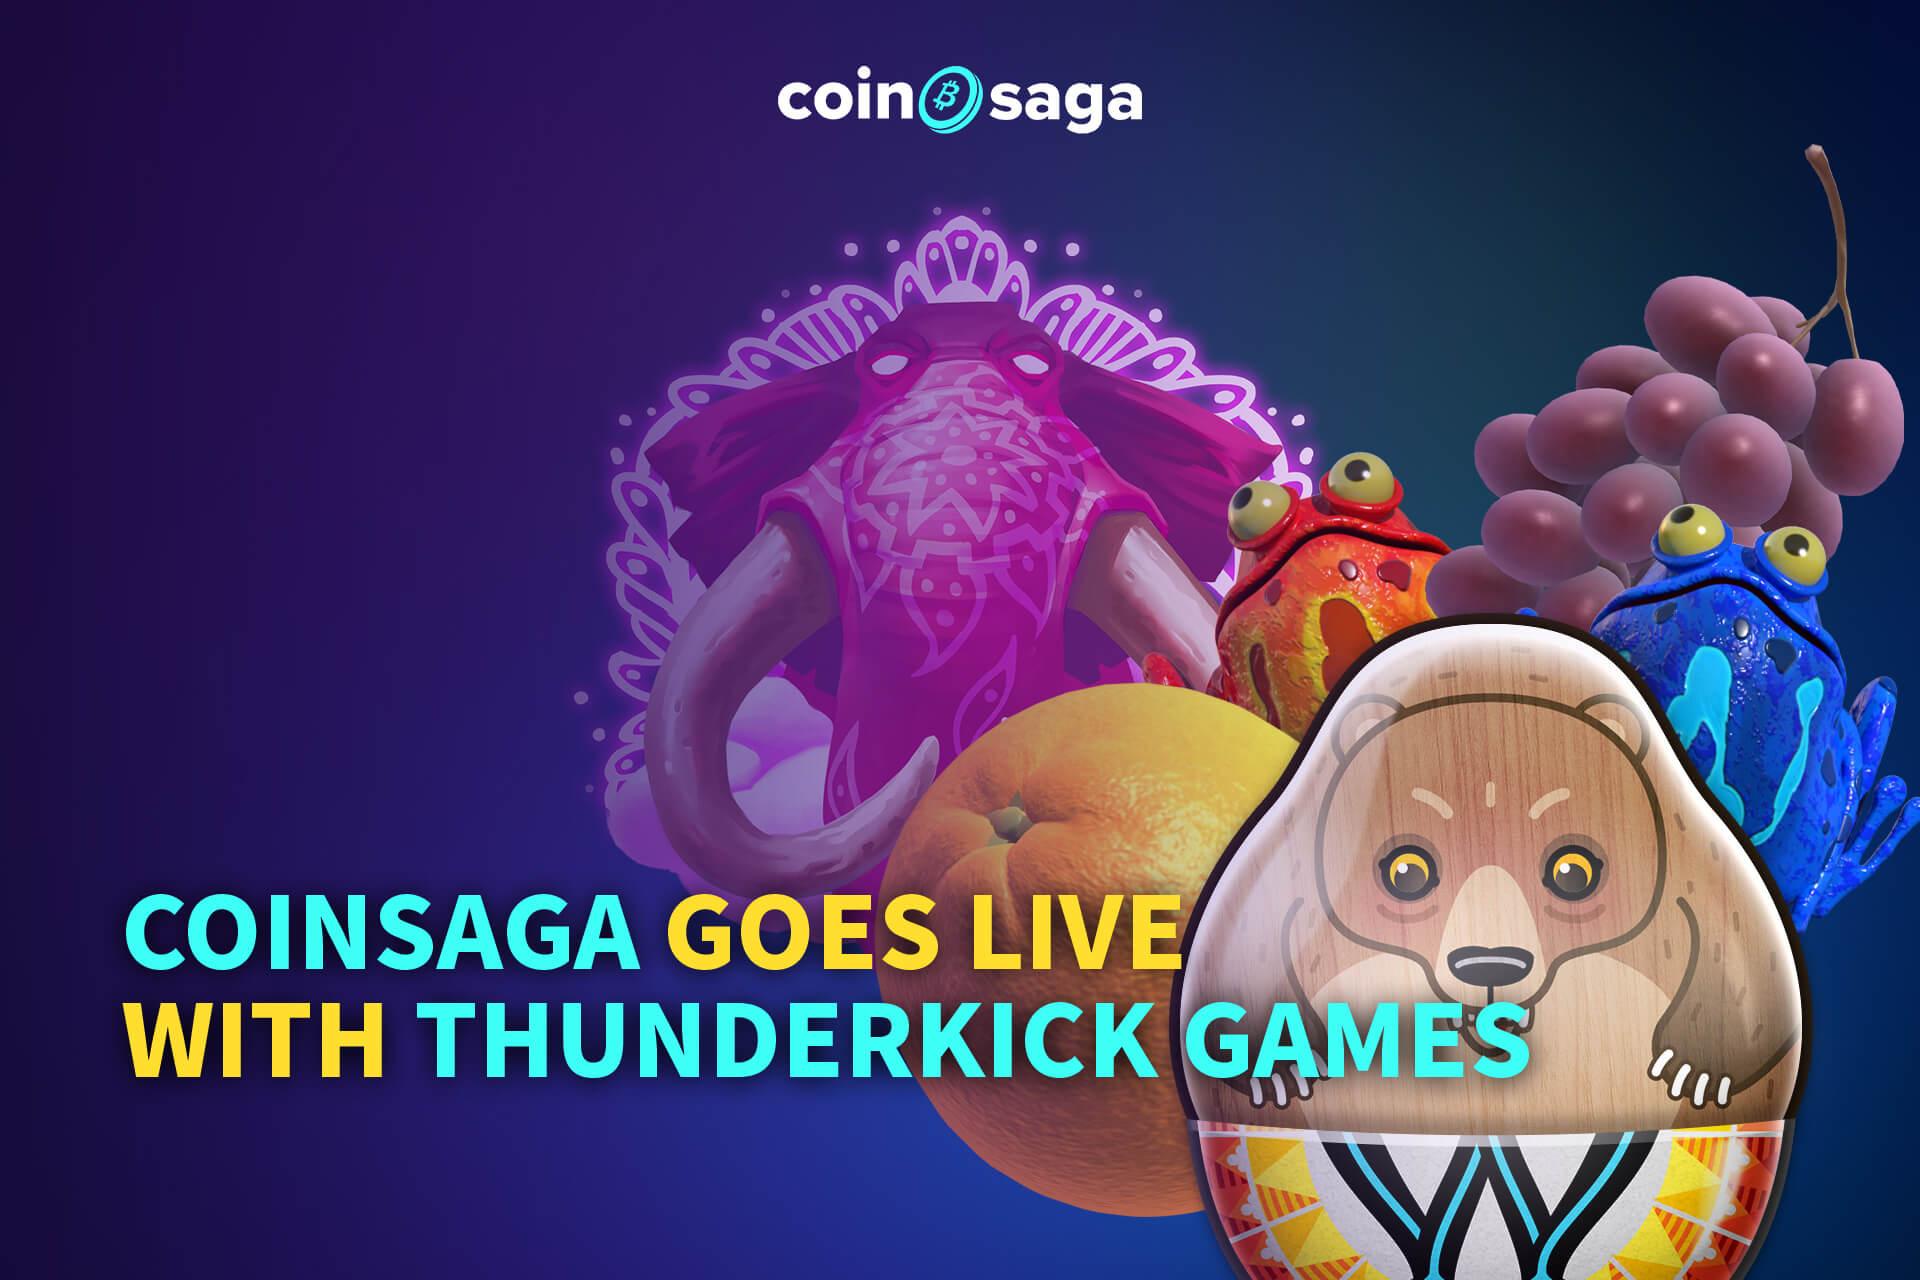 Thunderkick on Coinsaga